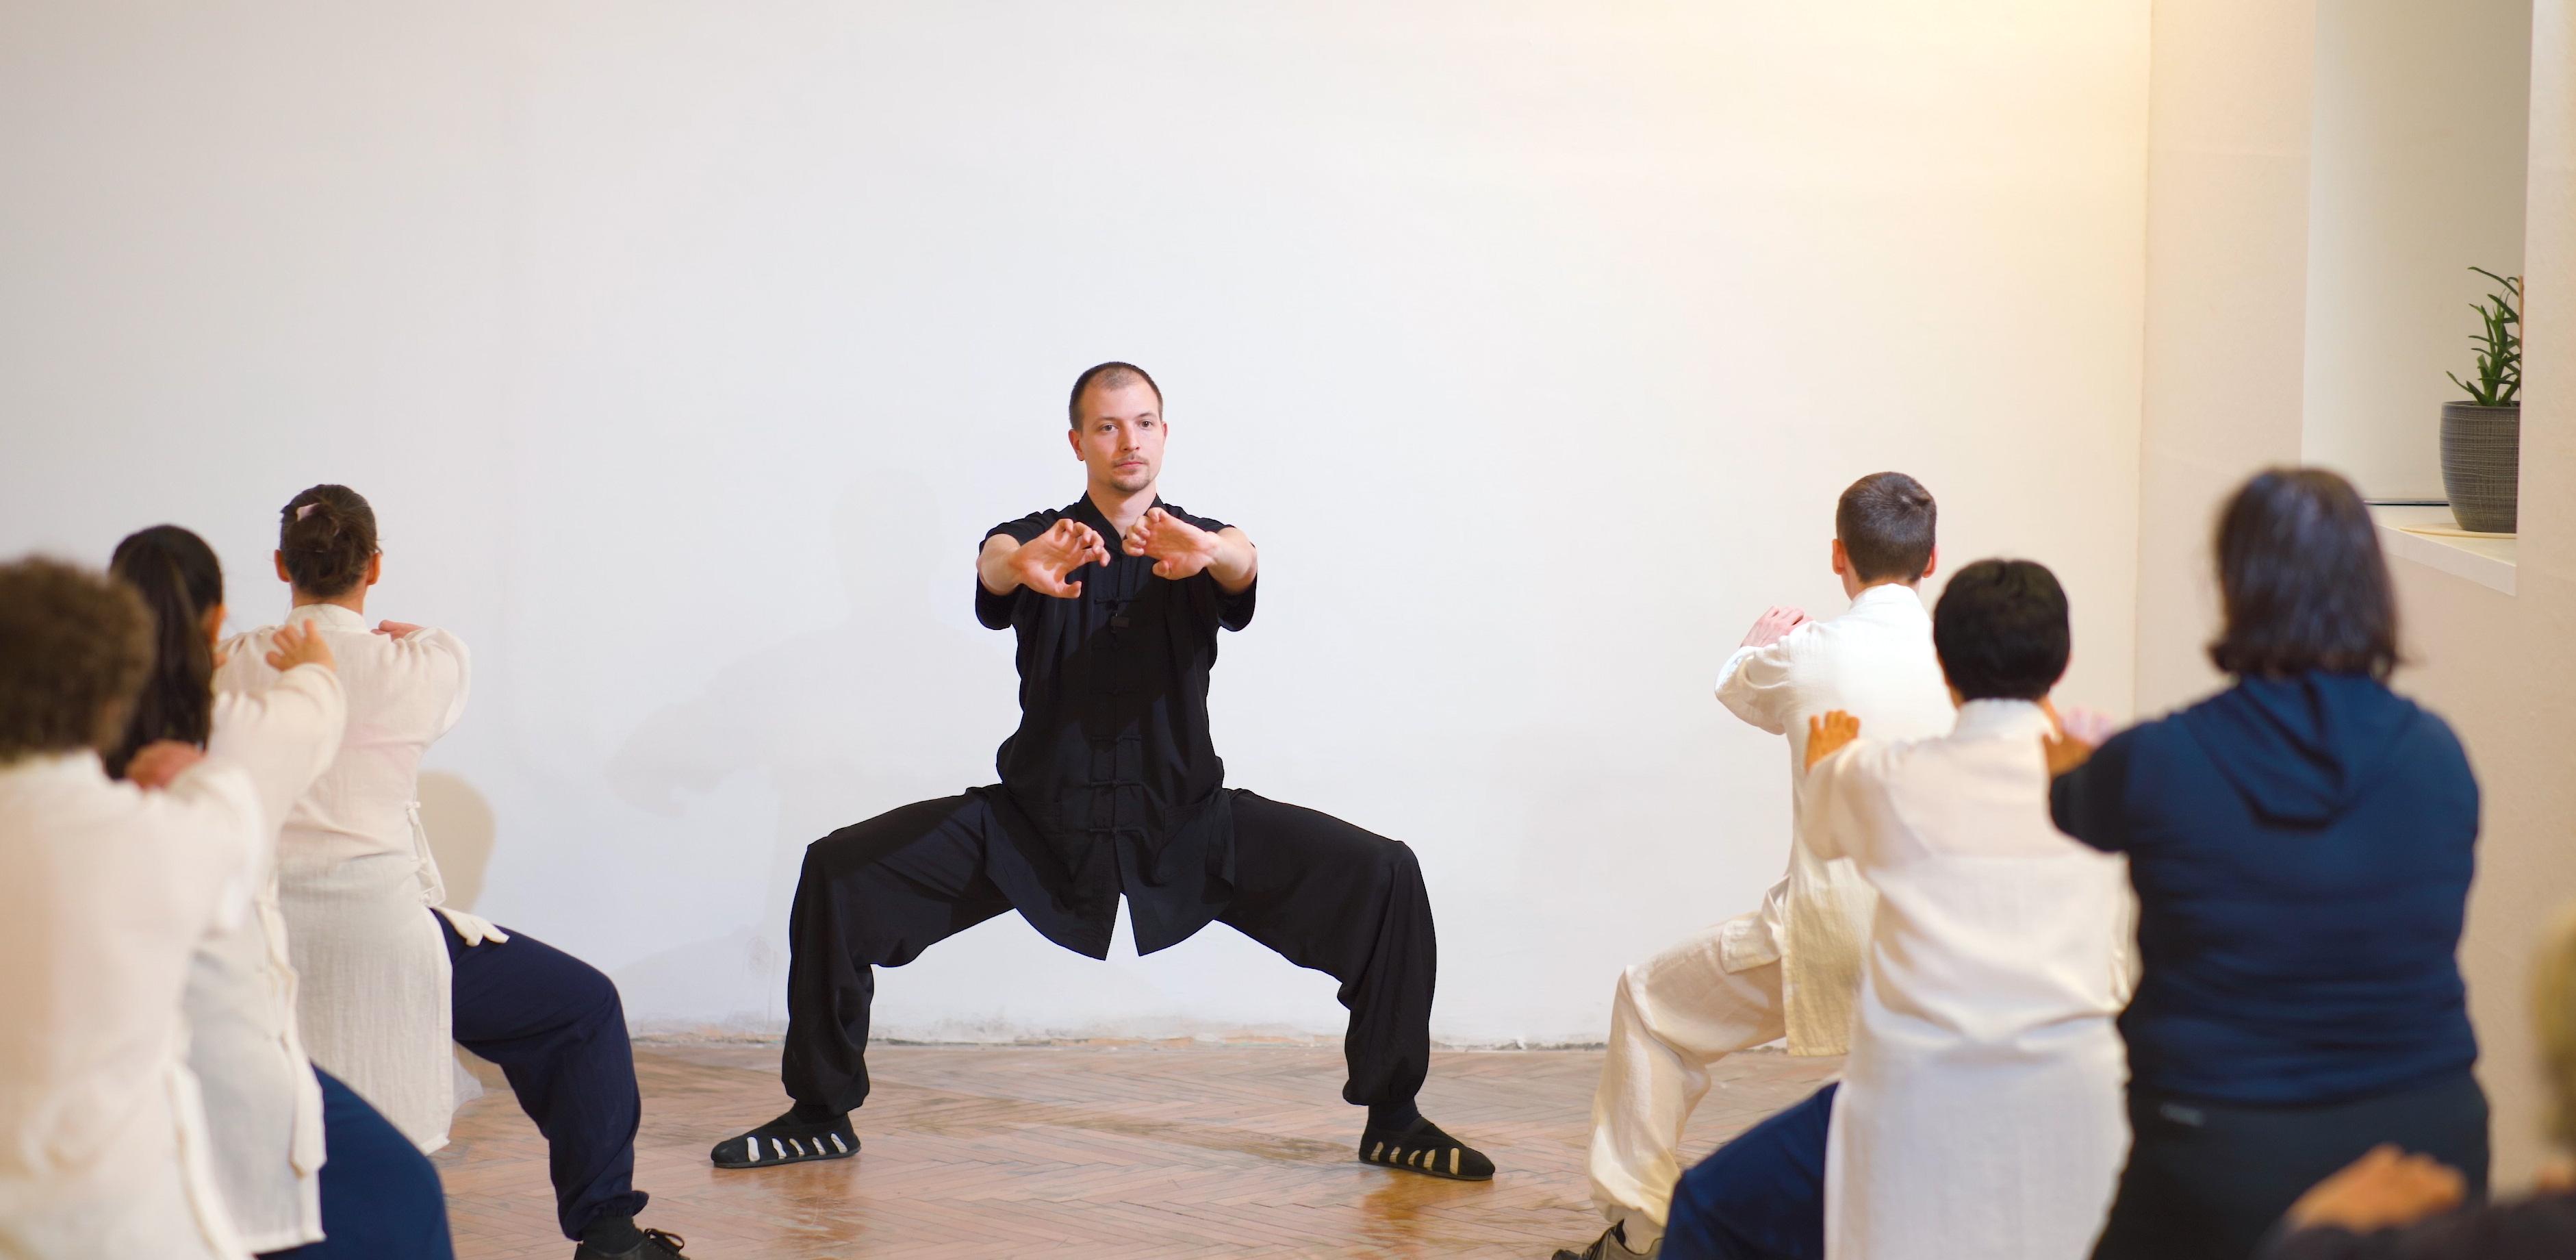 Breathing Rythm & What is Qi? Full Qi Gong Class